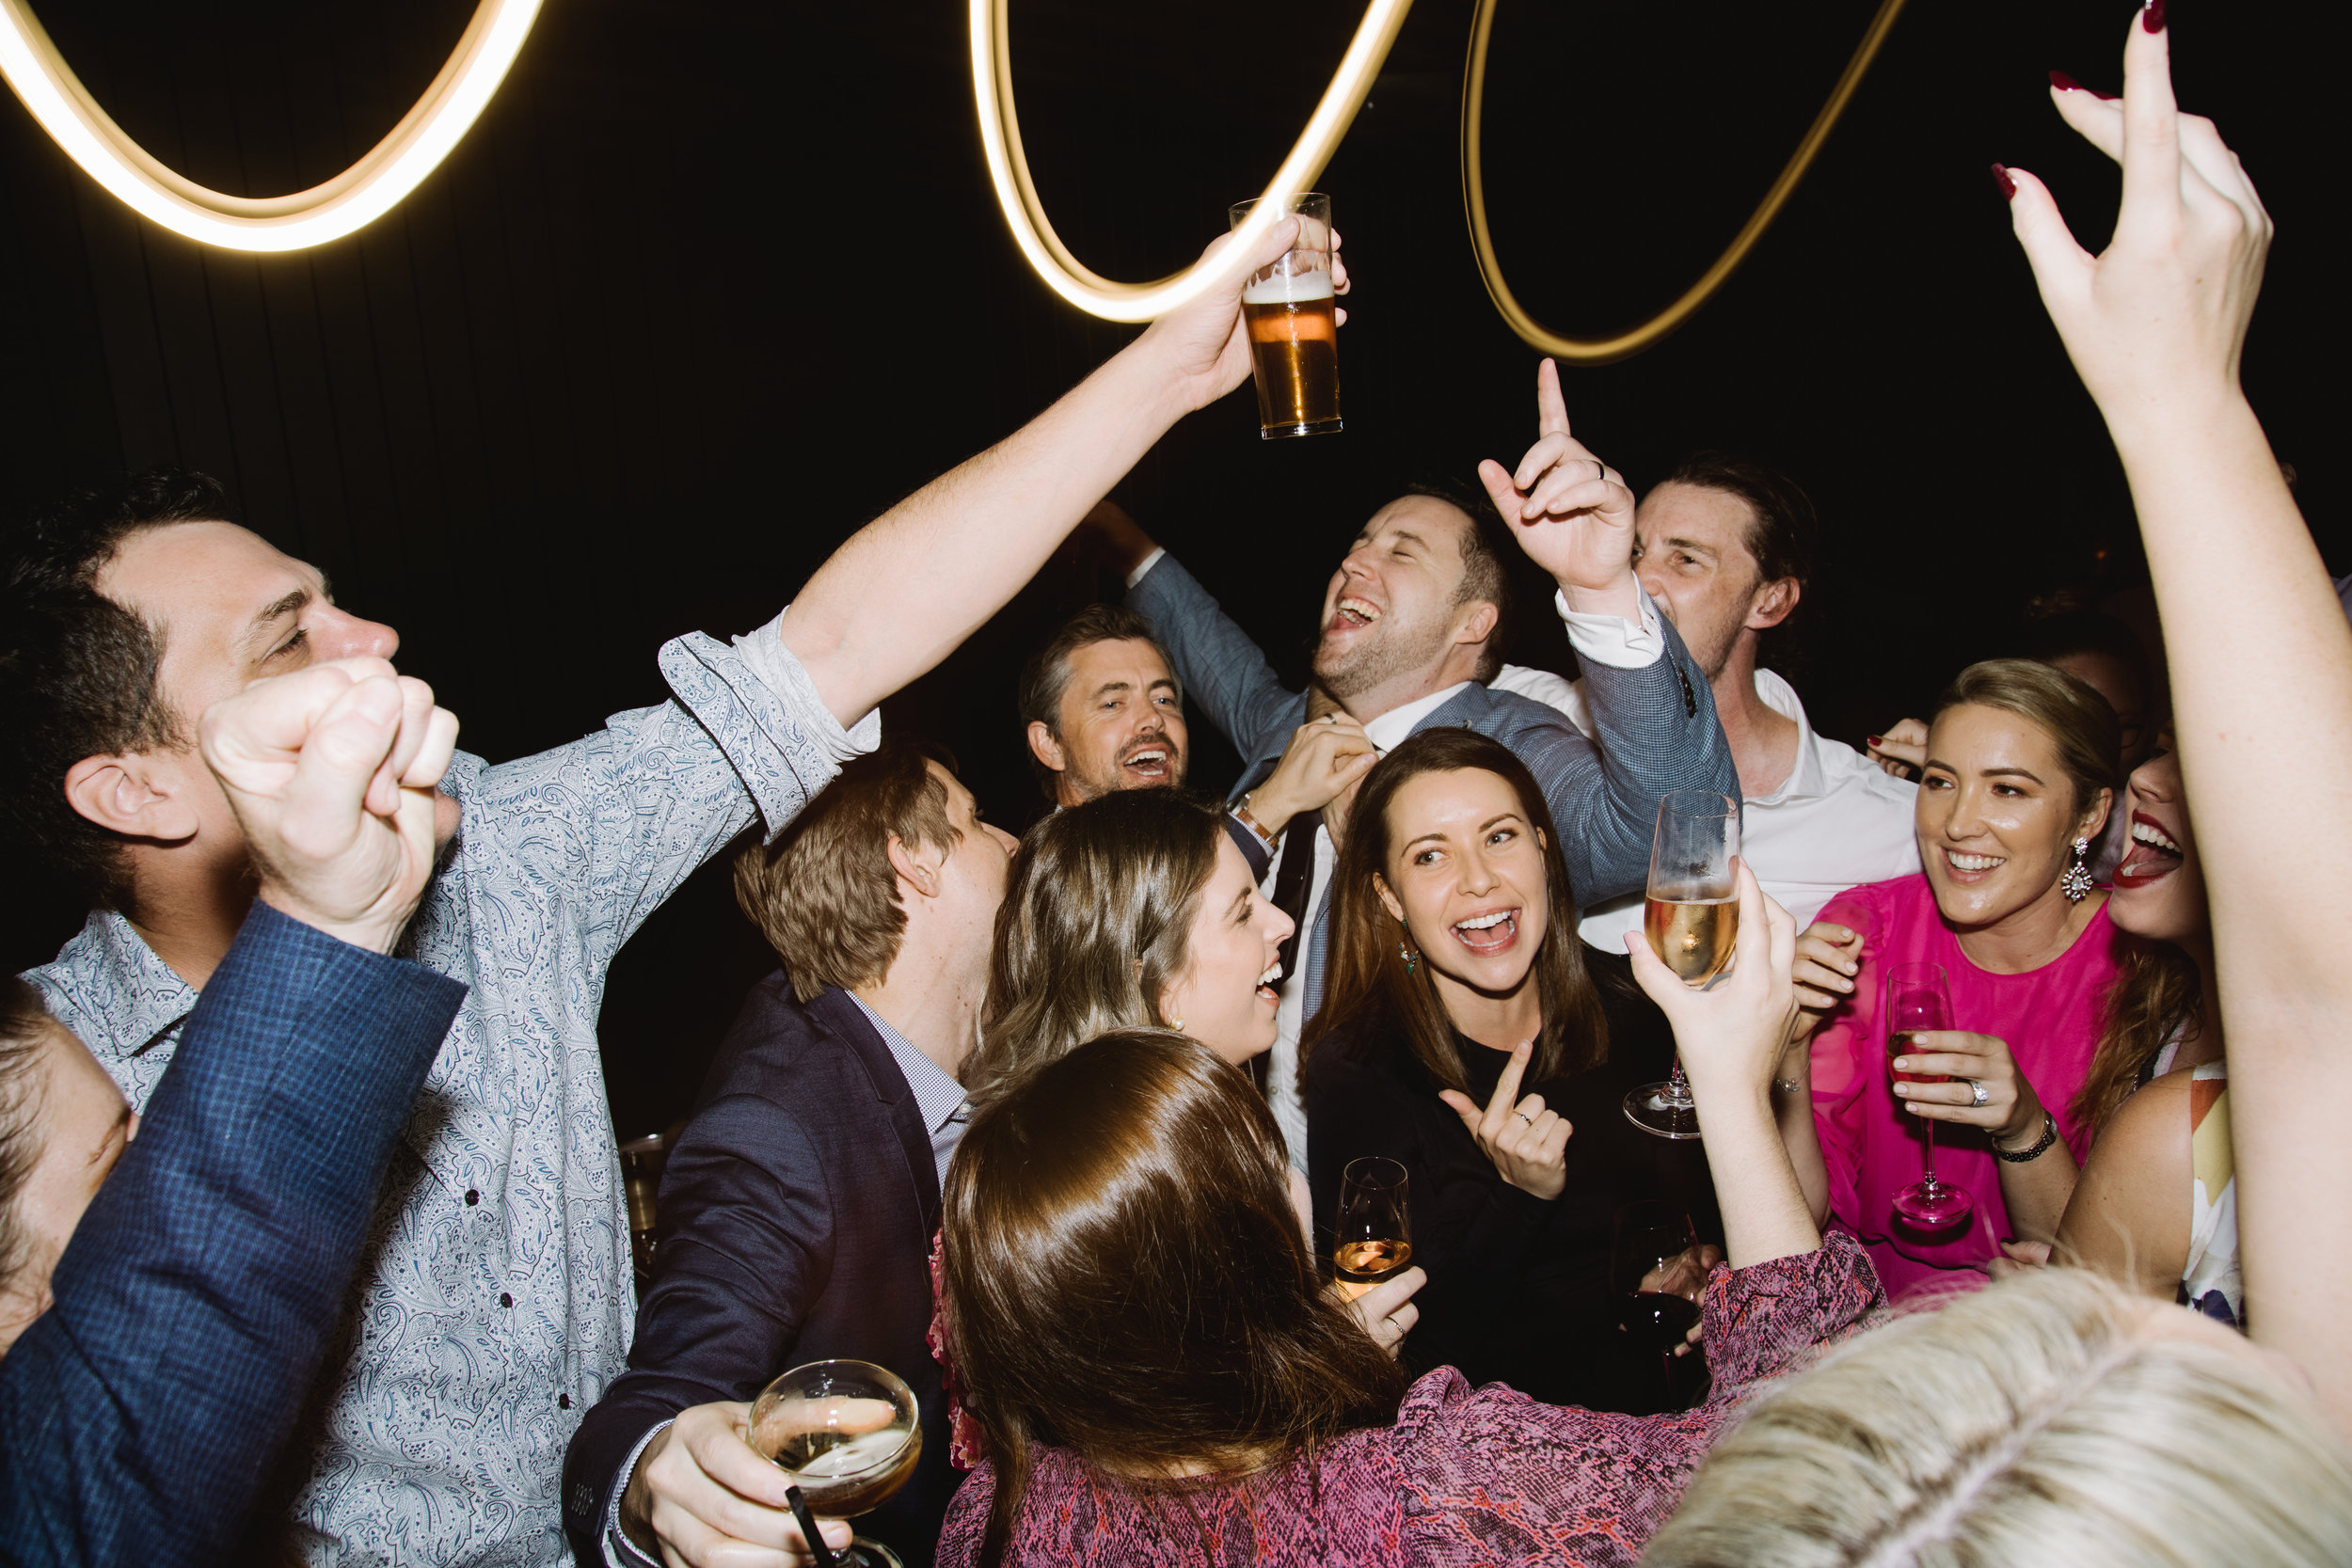 refinery-brisbane-wedding-reception-28.jpg